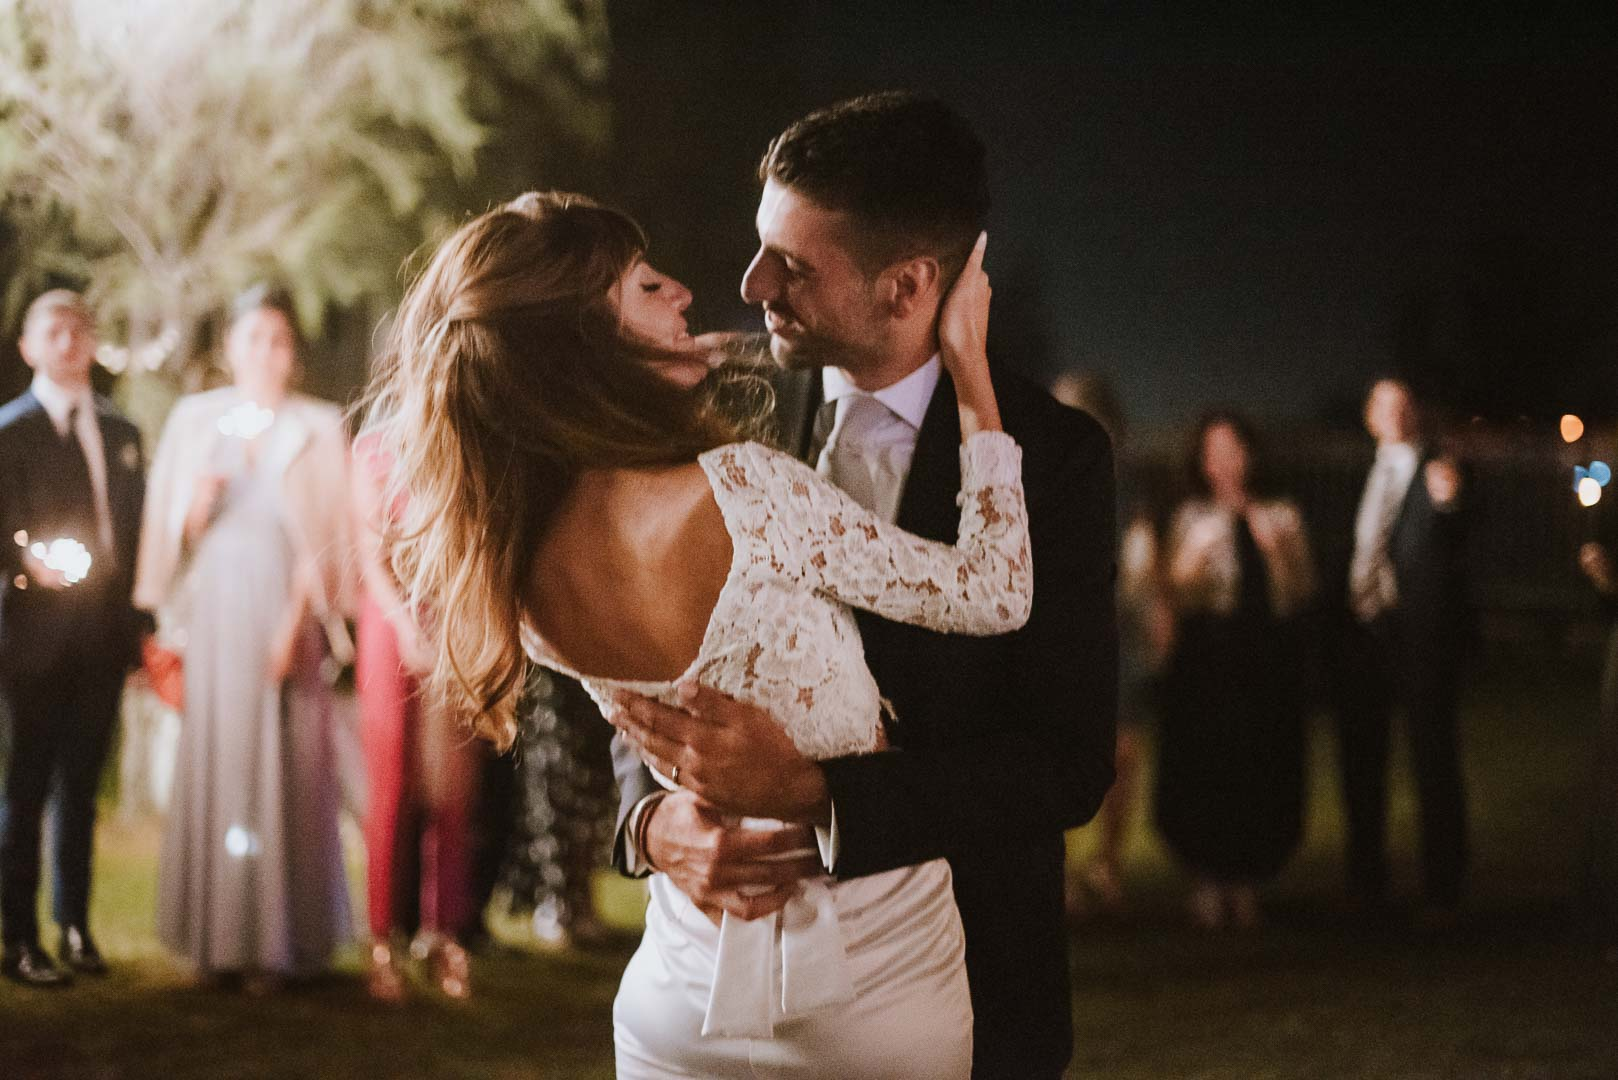 wedding-photographer-destination-fineart-bespoke-reportage-napoli-nabilah-vivianeizzo-spazio46-199